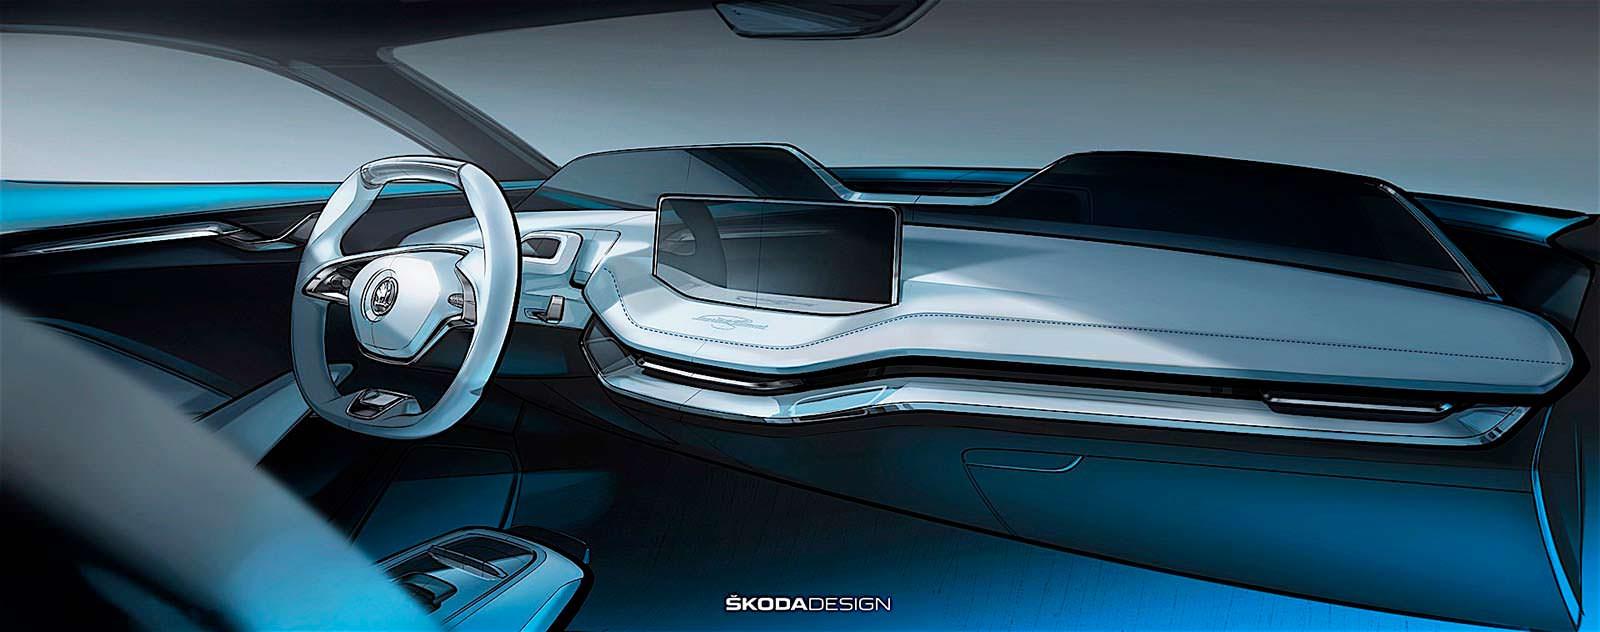 Фото   Салон Skoda VisionE с цифровыми экранами